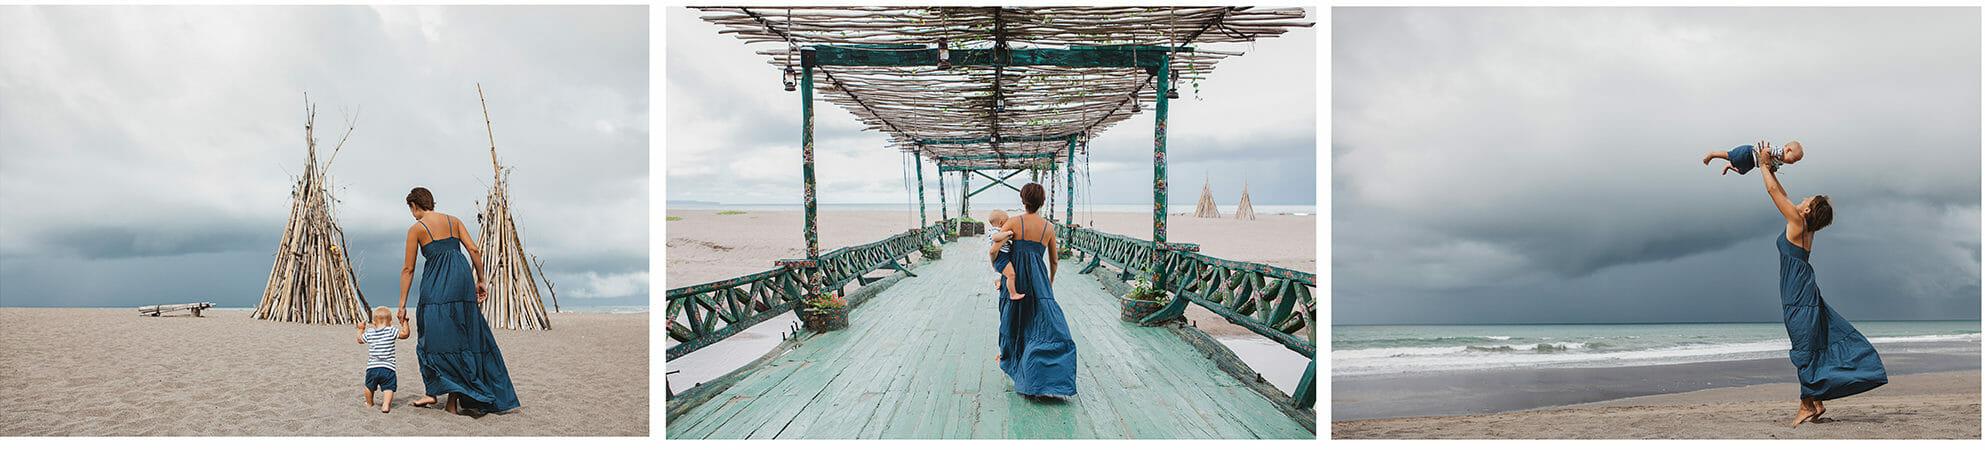 magical photograph snapshot beach jetty pier